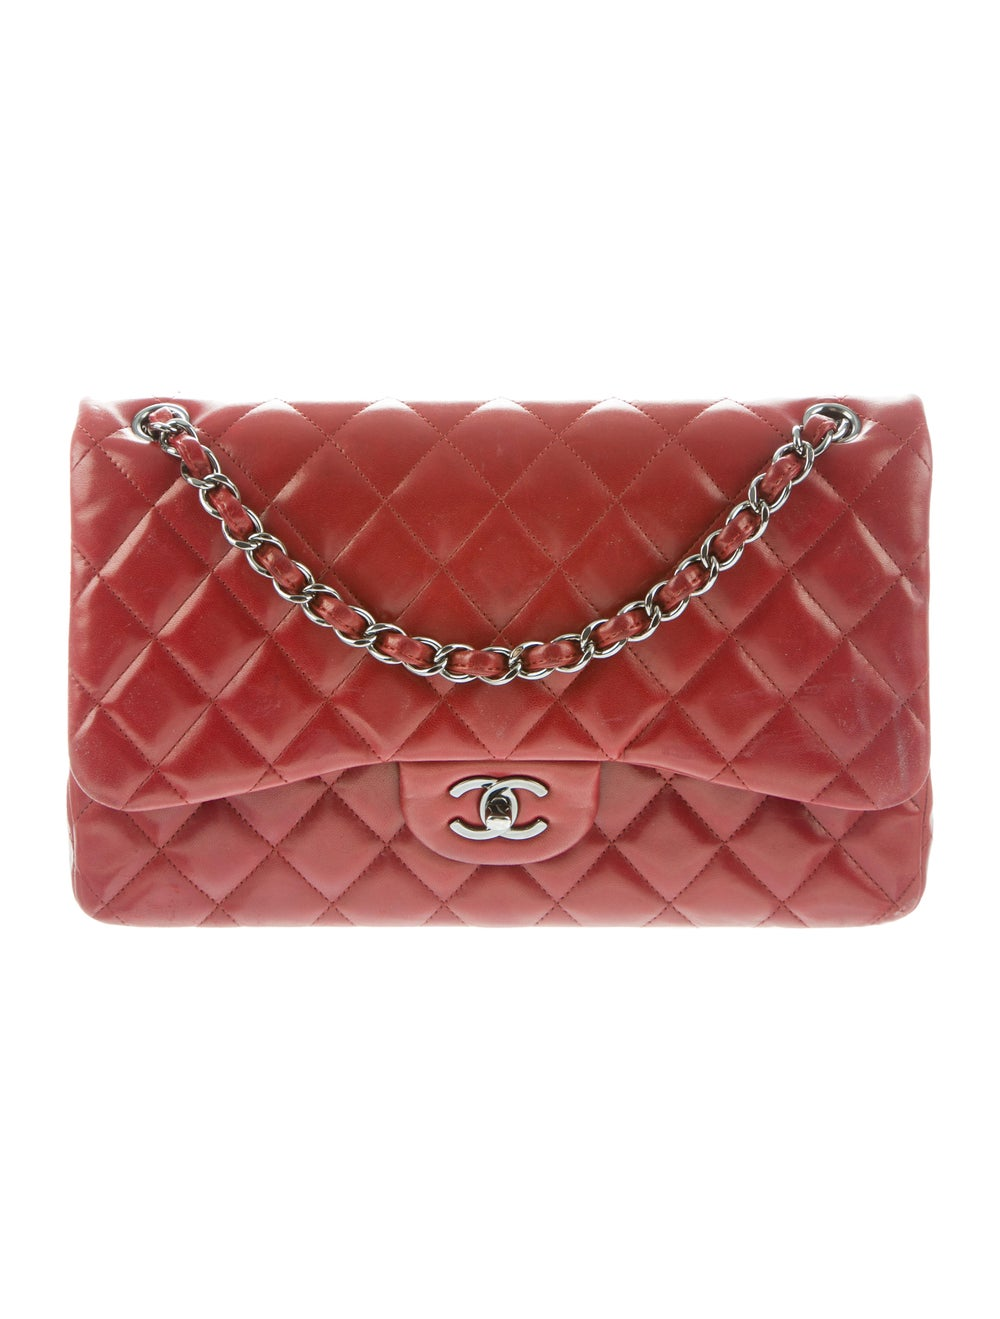 Chanel Jumbo Classic Double Flap Bag silver - image 1